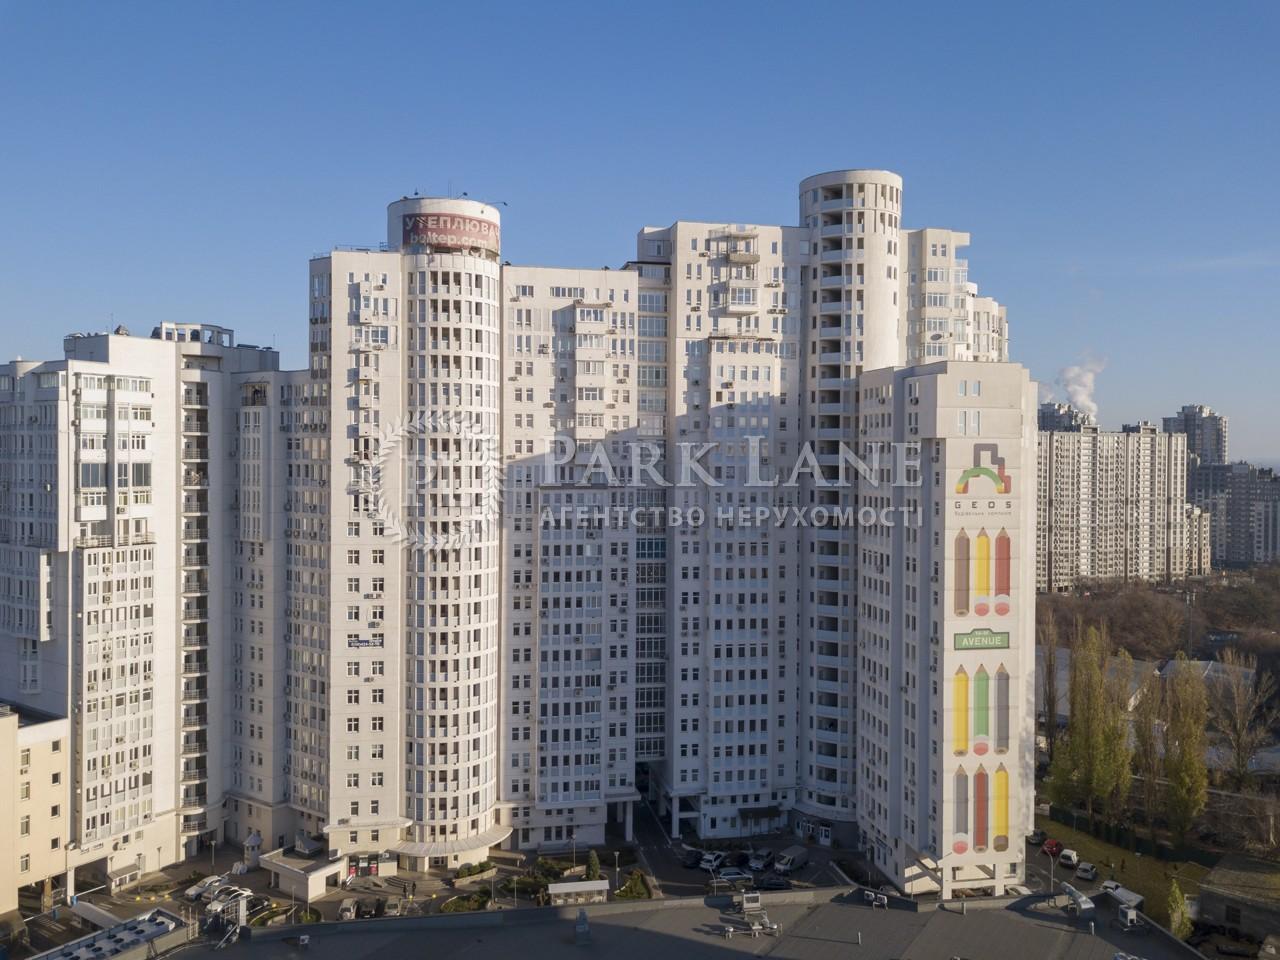 Pecherskyi kvartal